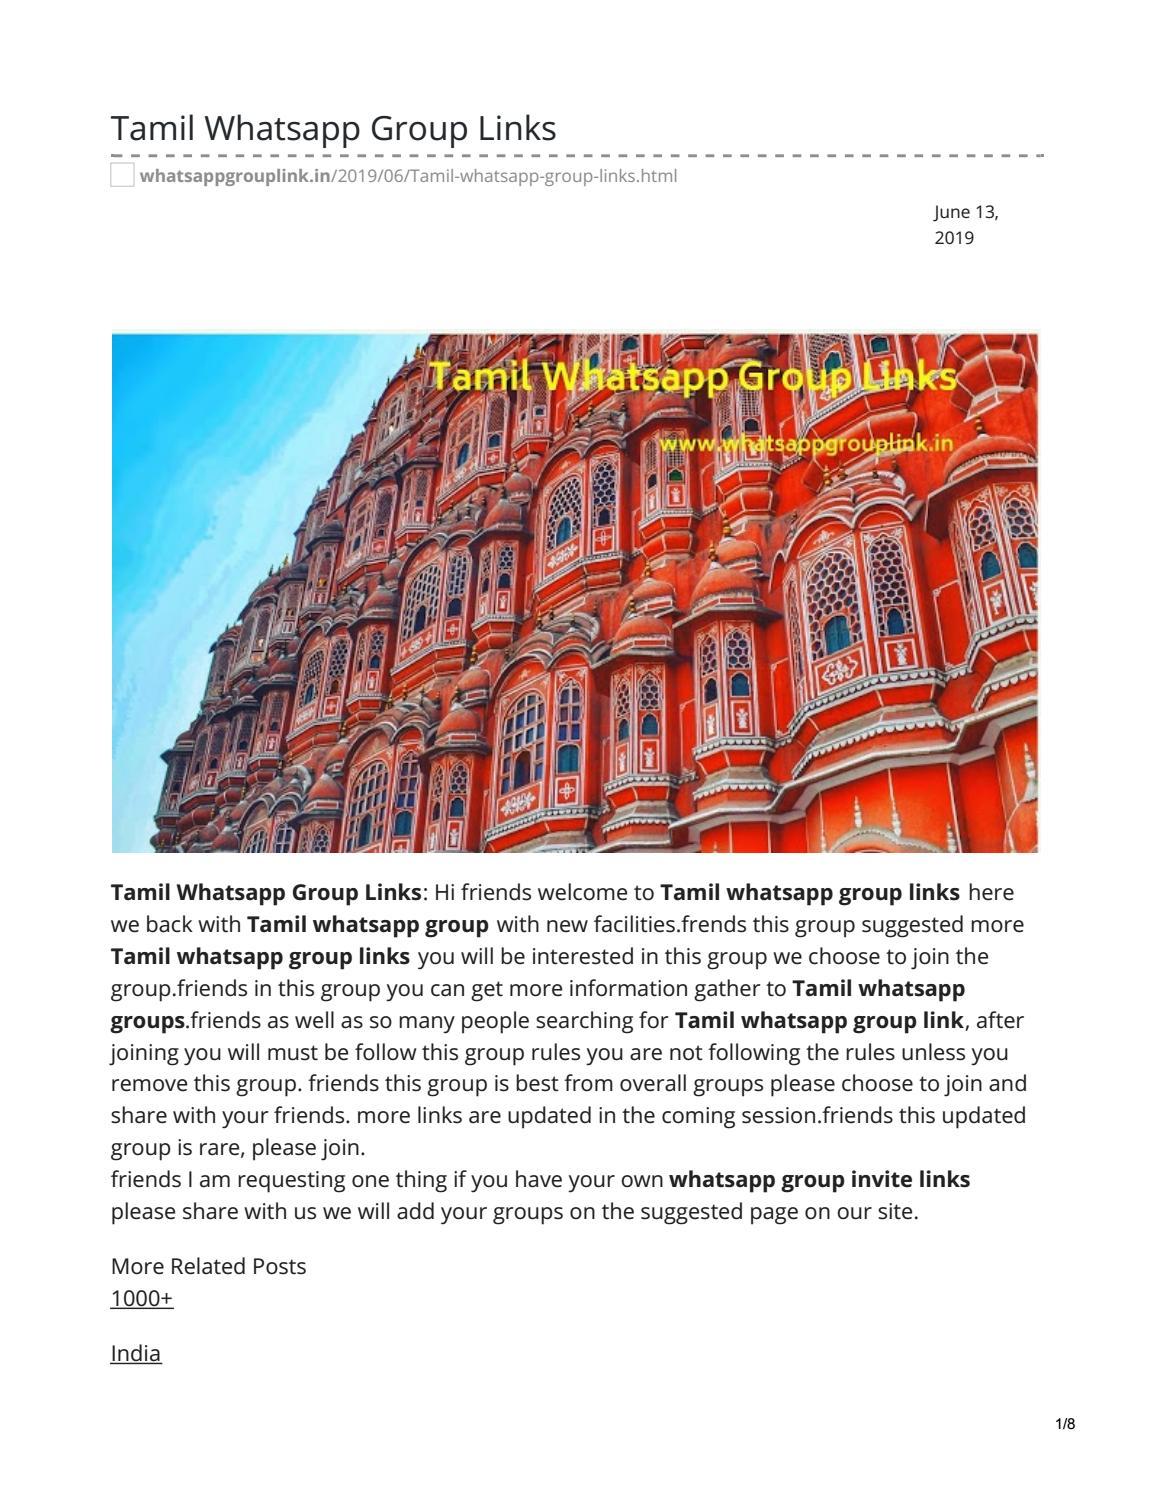 Tamil Whatsapp Group Links by whatsappgrouplink77 - issuu